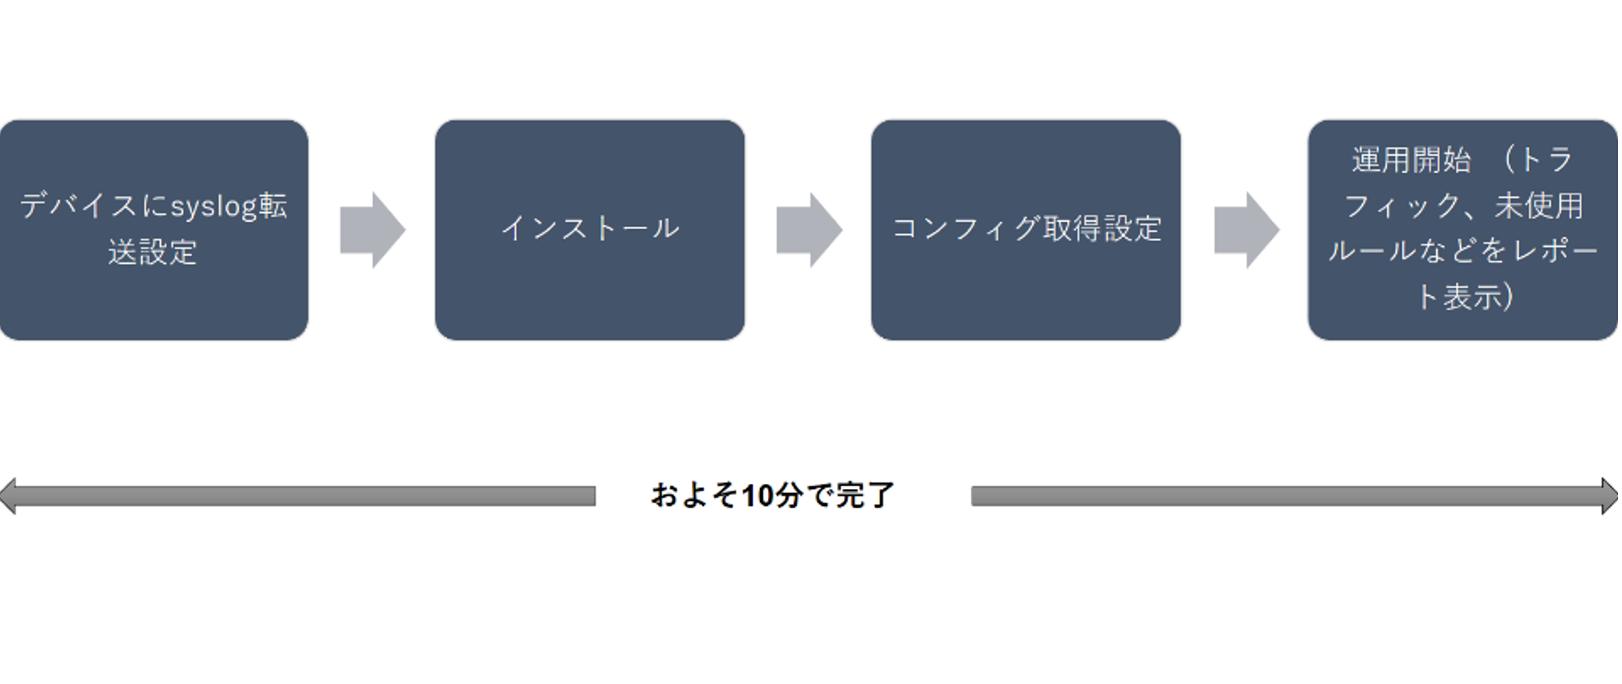 Firewall Analyzer:導入までの手順